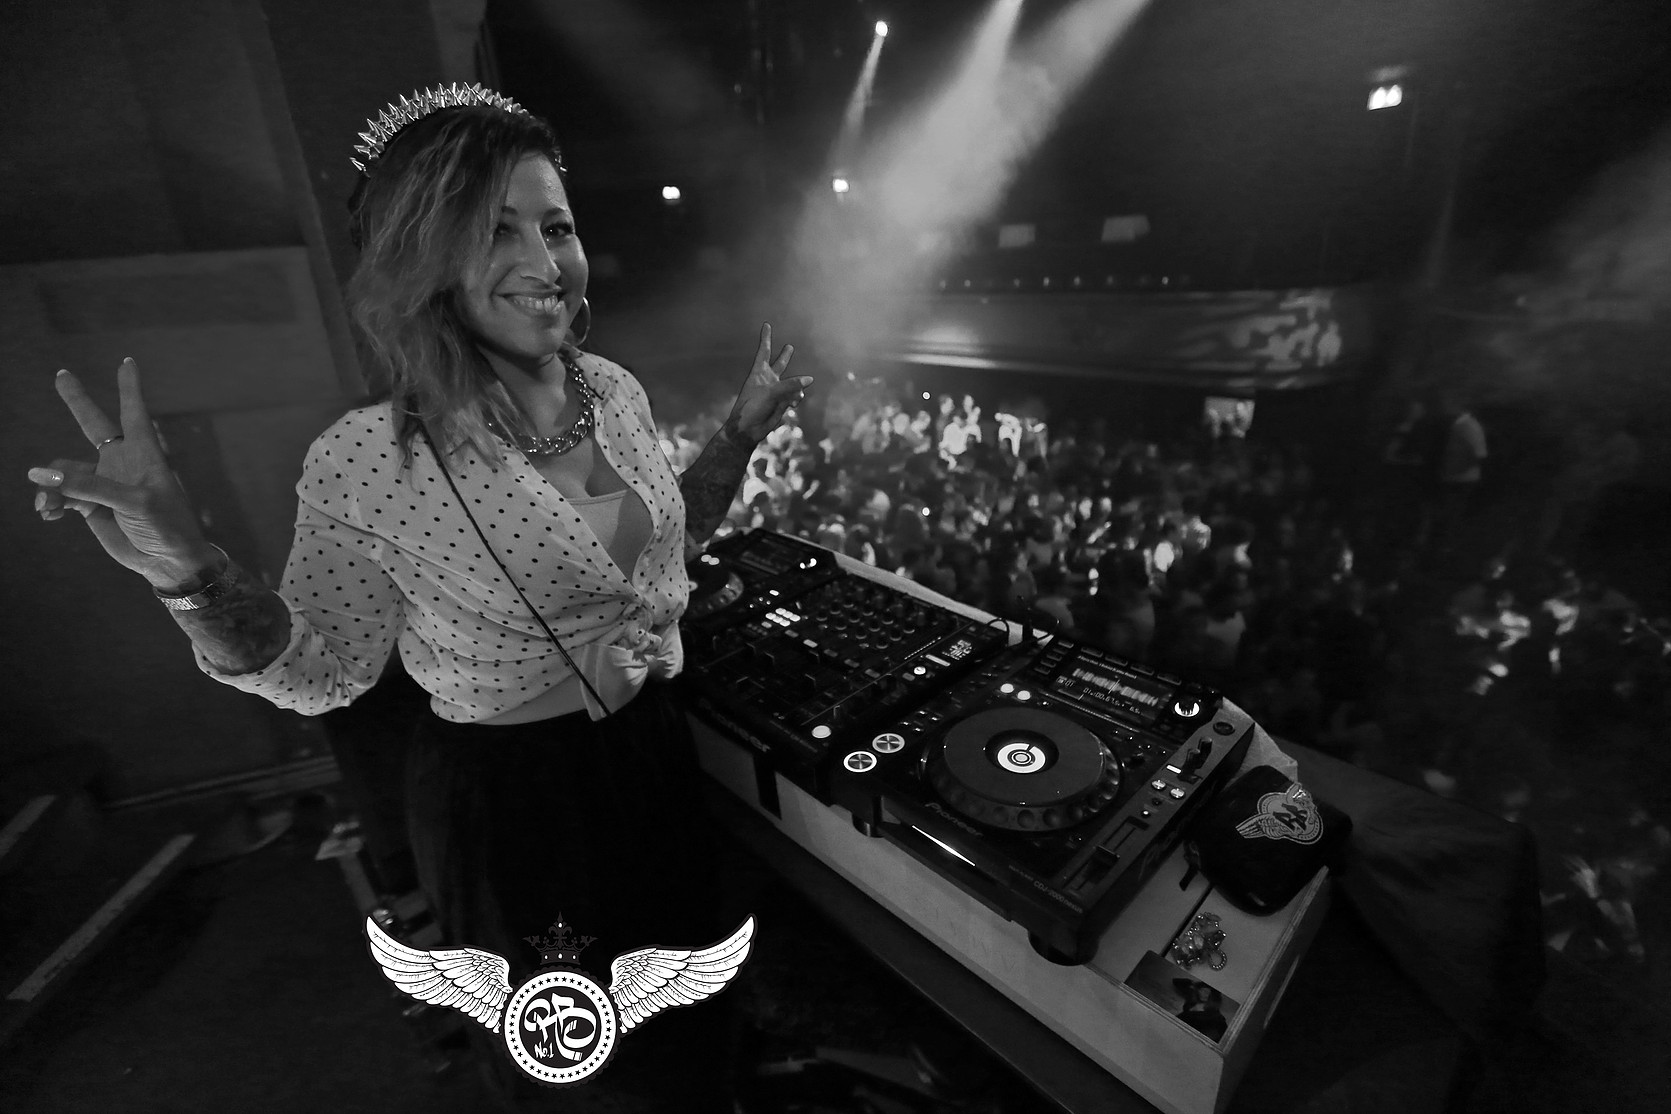 DJ Miss Brown bij DJ Booth op balkon